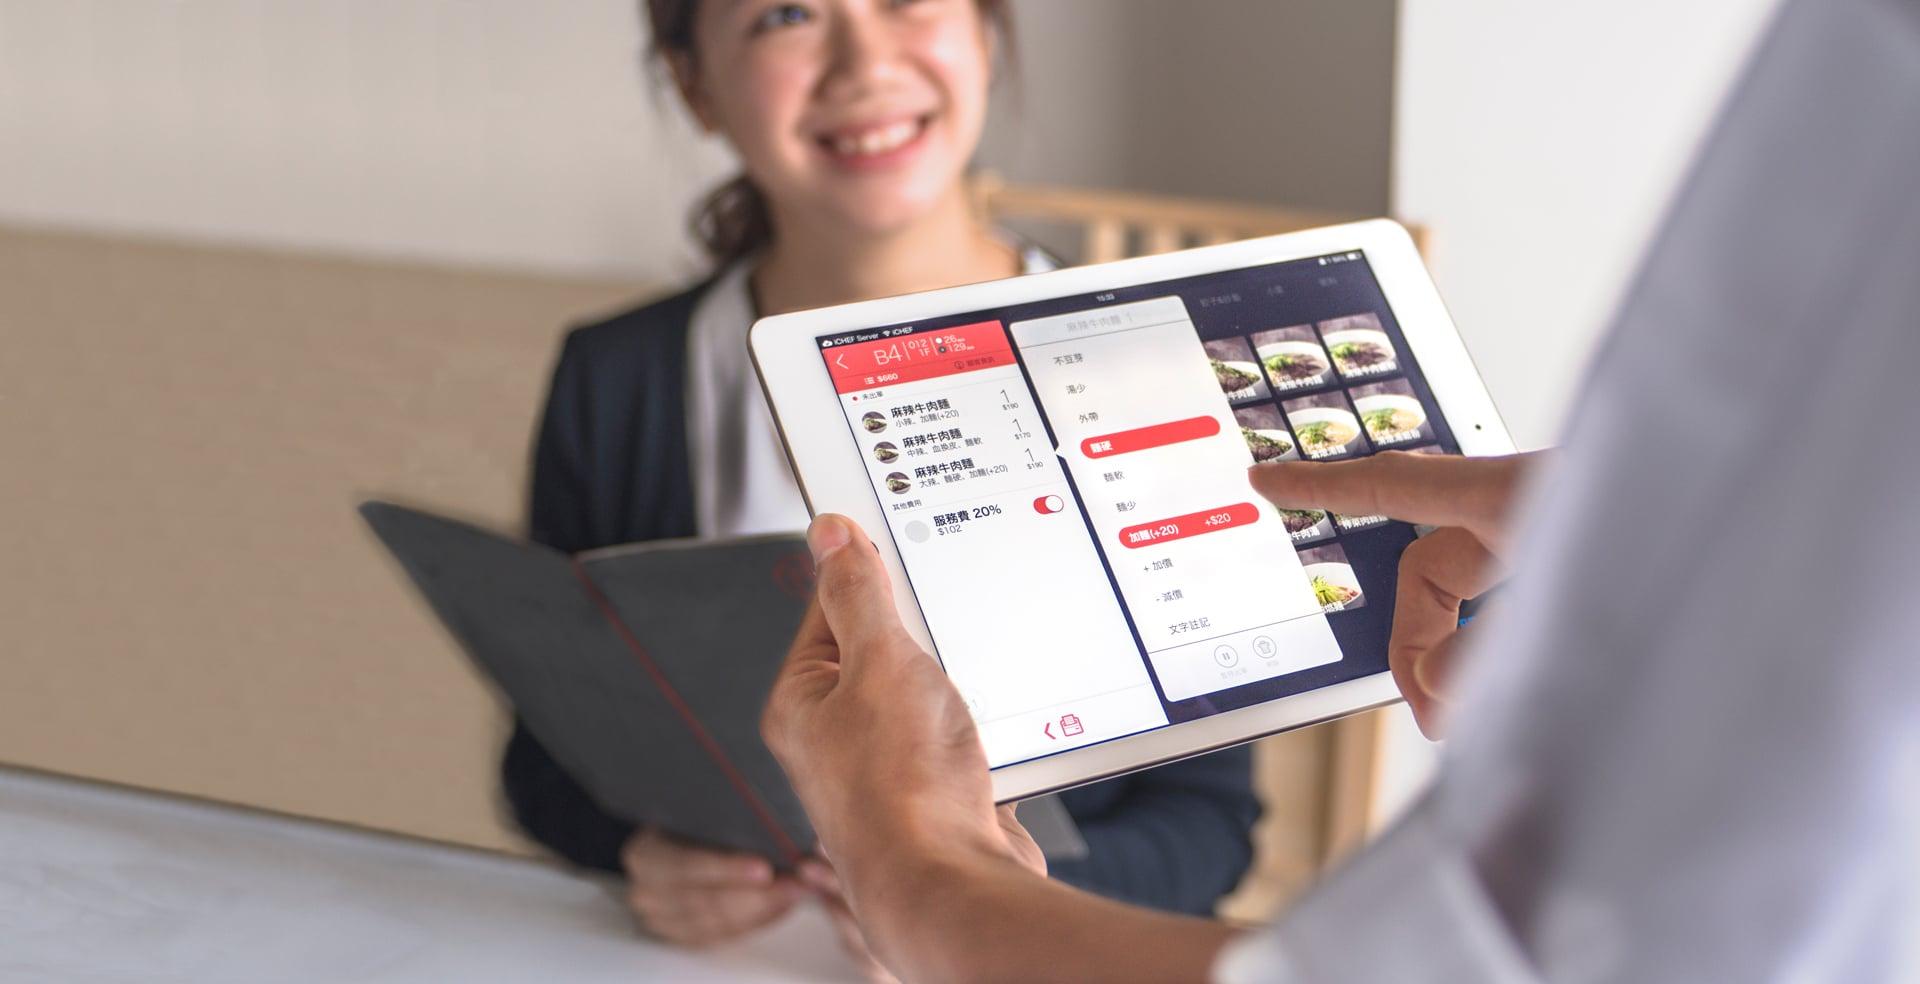 iCHEF POS 點餐系統|一臺iPad搞定點餐,沒有多餘的功能按鍵,000臺幣左右,兼顧店務管理與銷售分析的需求,餐飲分析報表